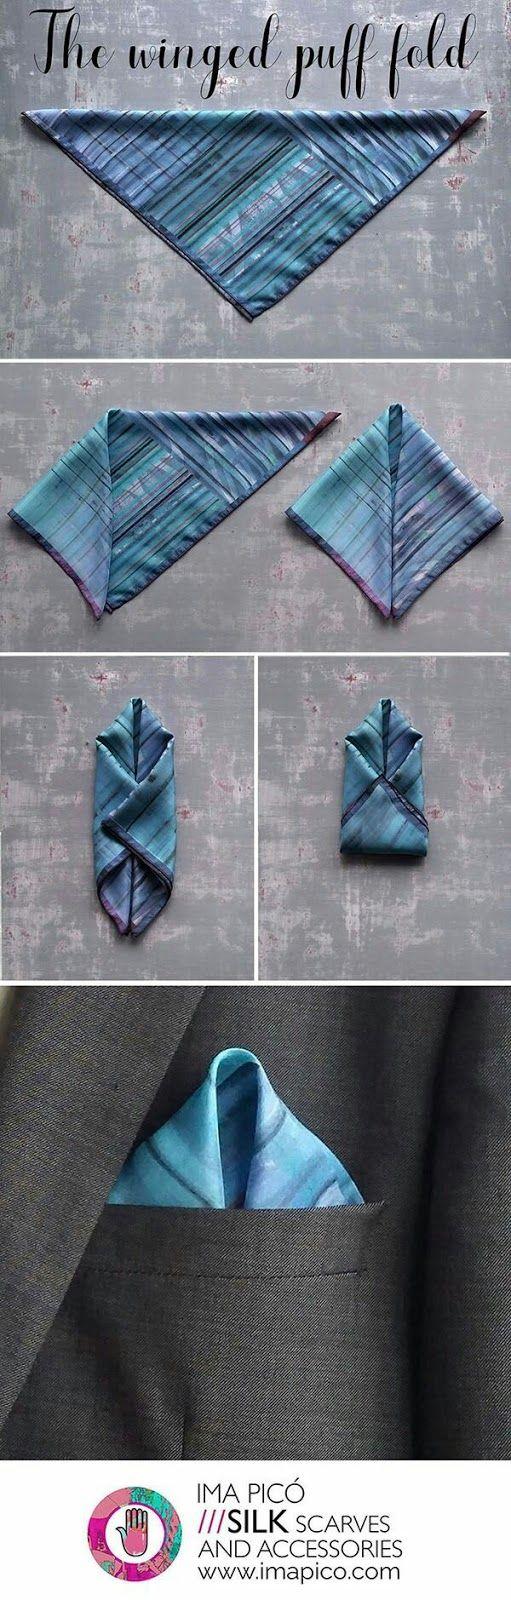 BlackDot: Men's Fashion: How to Fold a Pocket Square